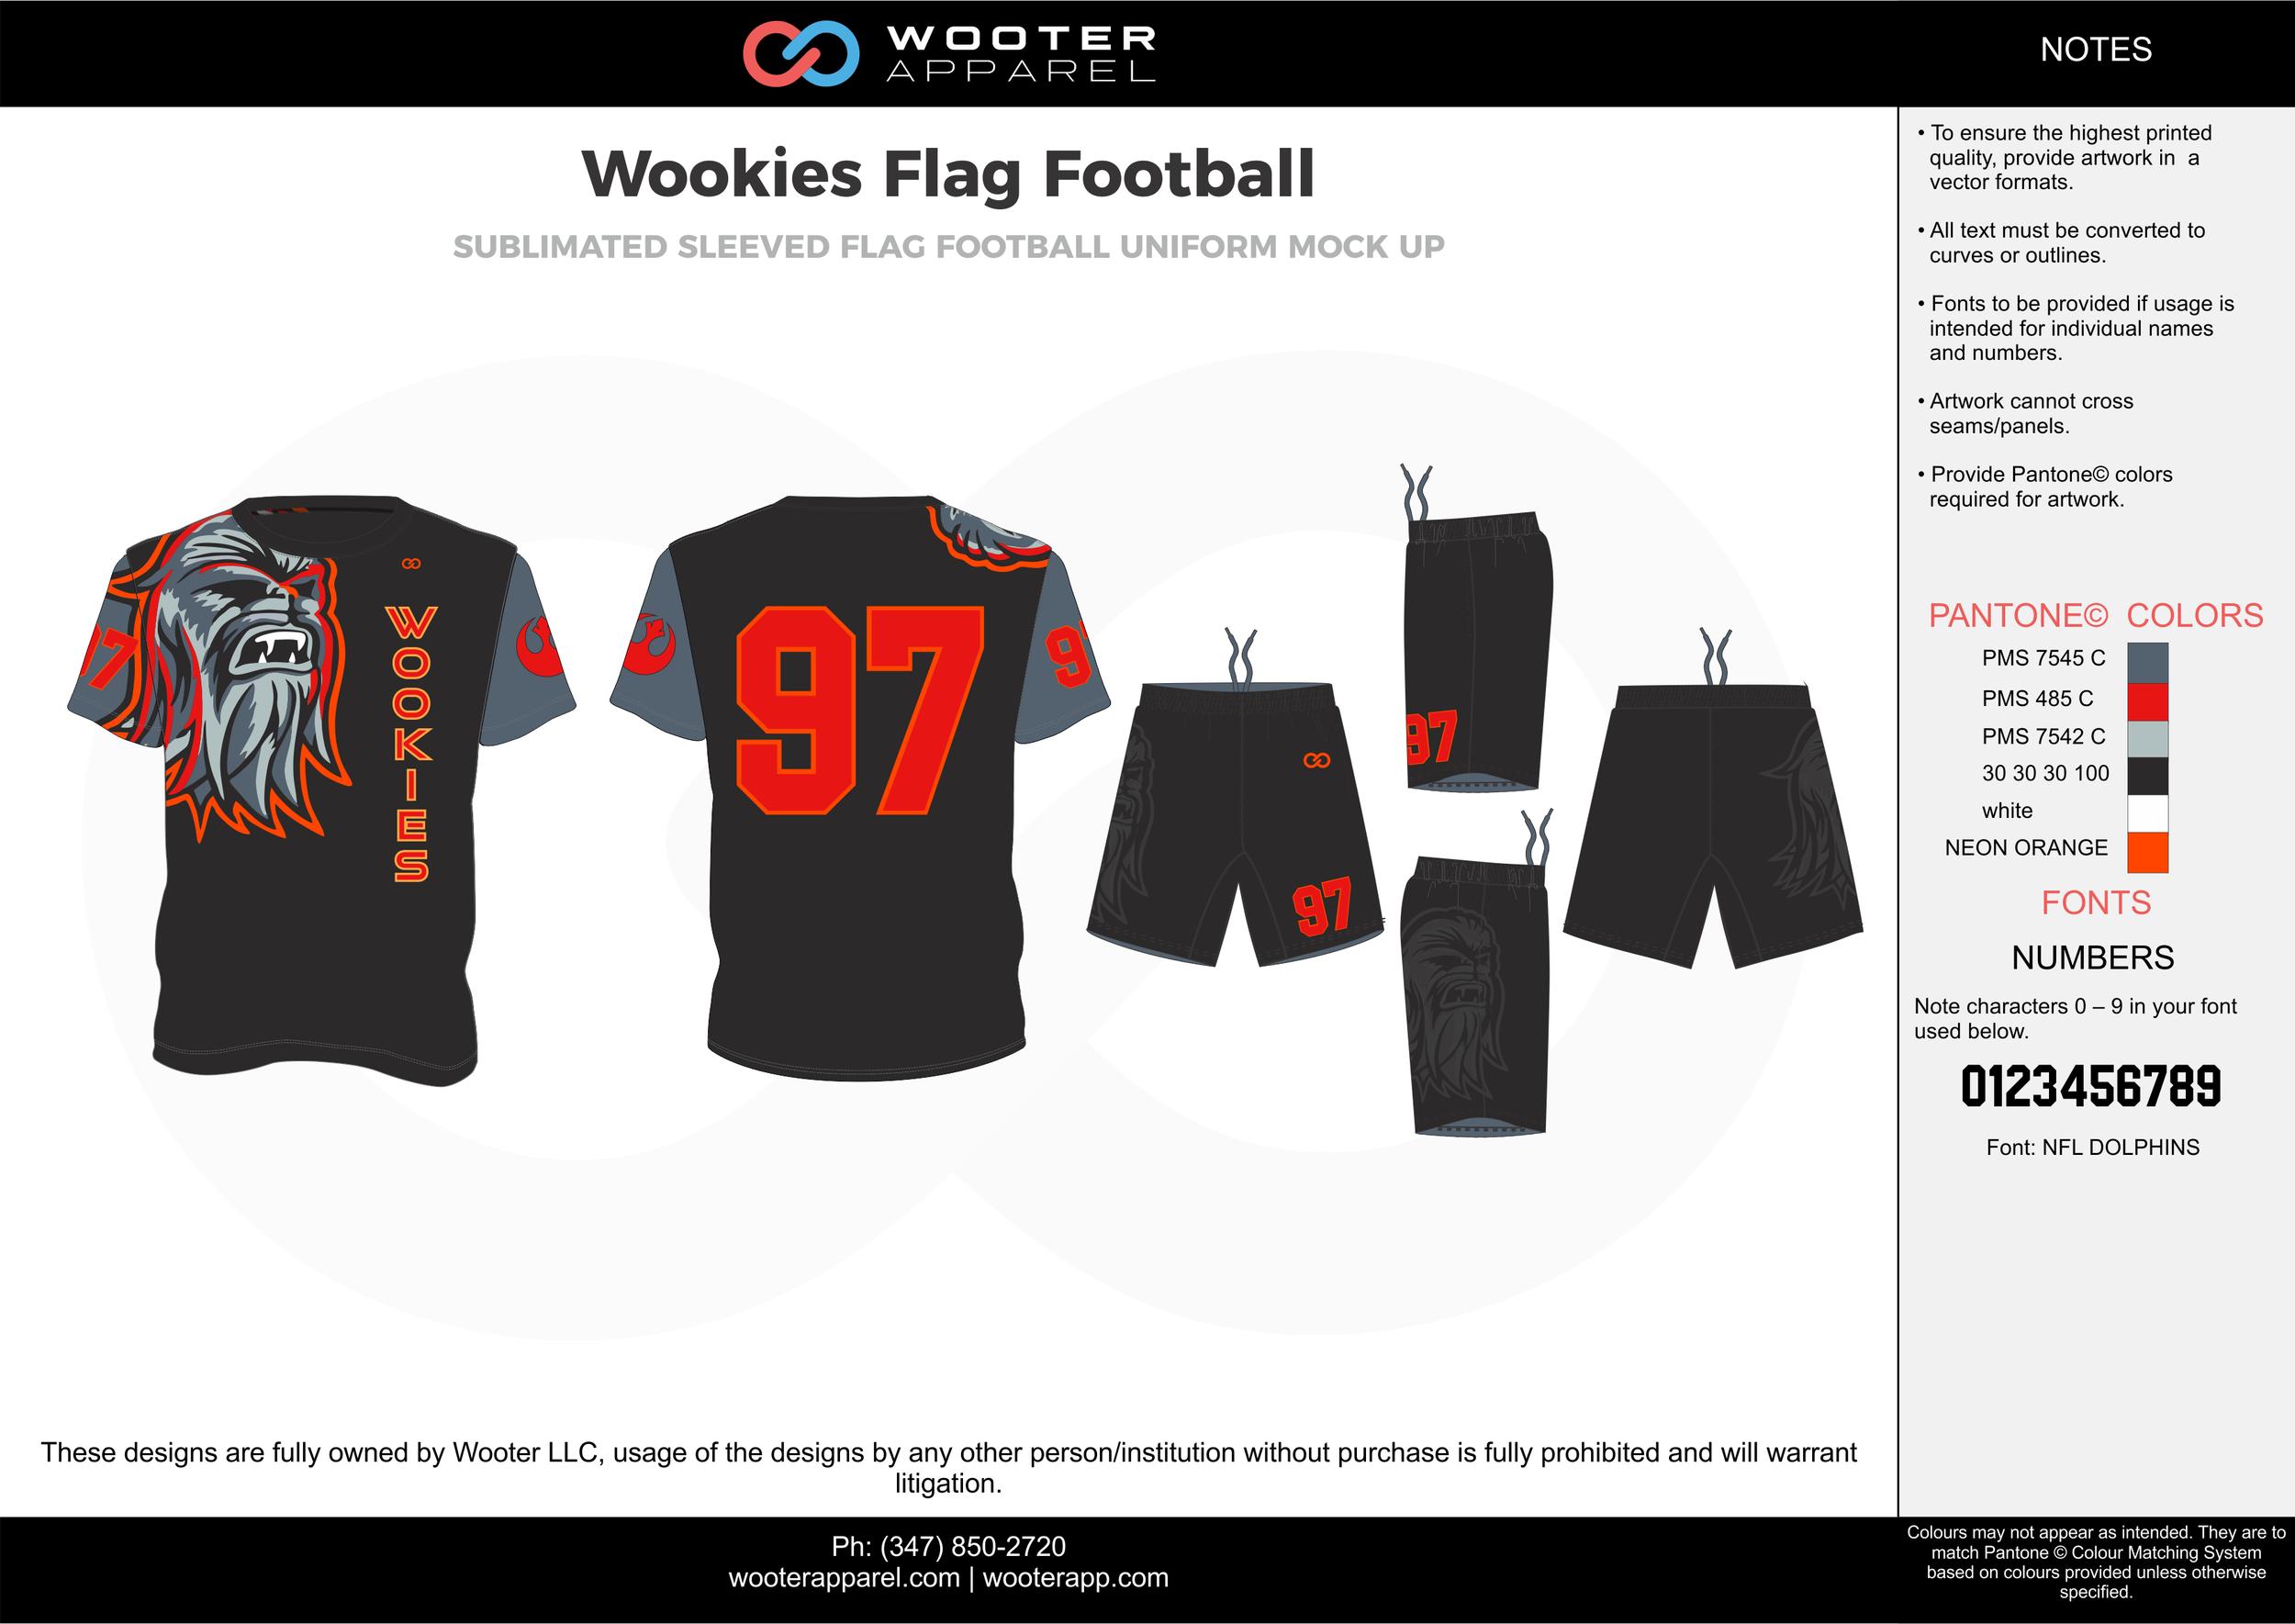 Wookies Flag Football black red gray flag football uniforms jerseys shorts